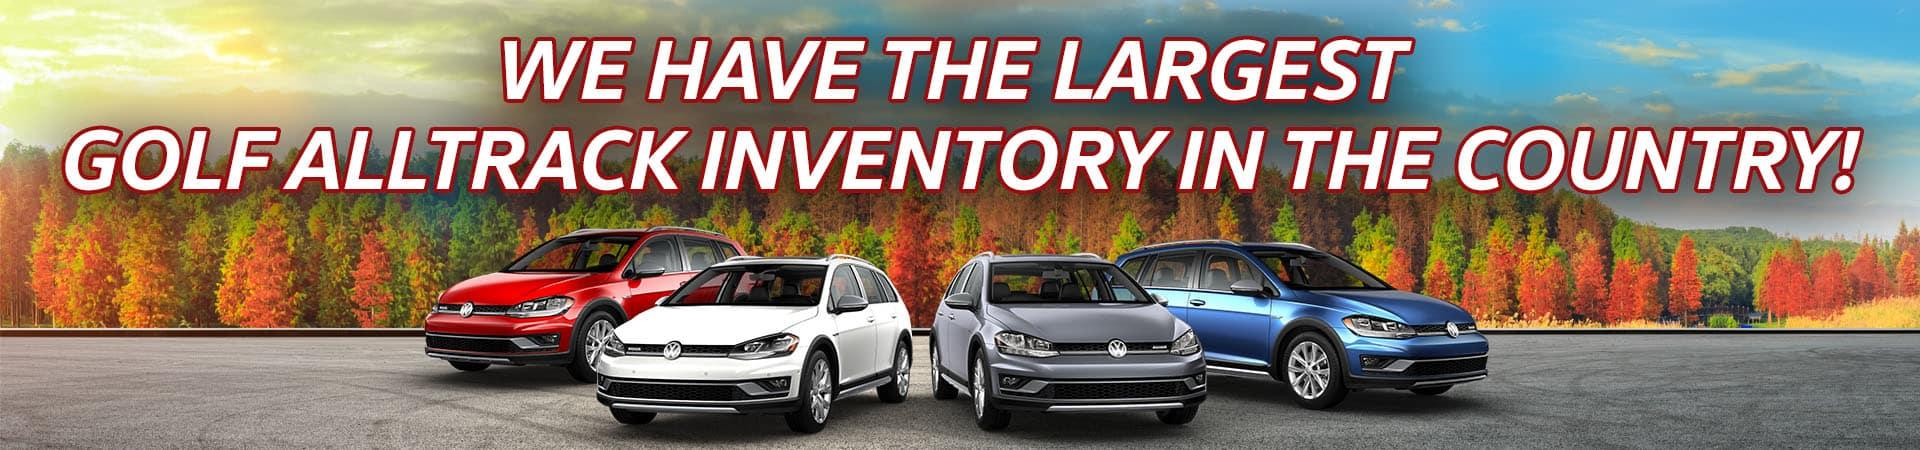 October Golf Alltrack Inventory Slide